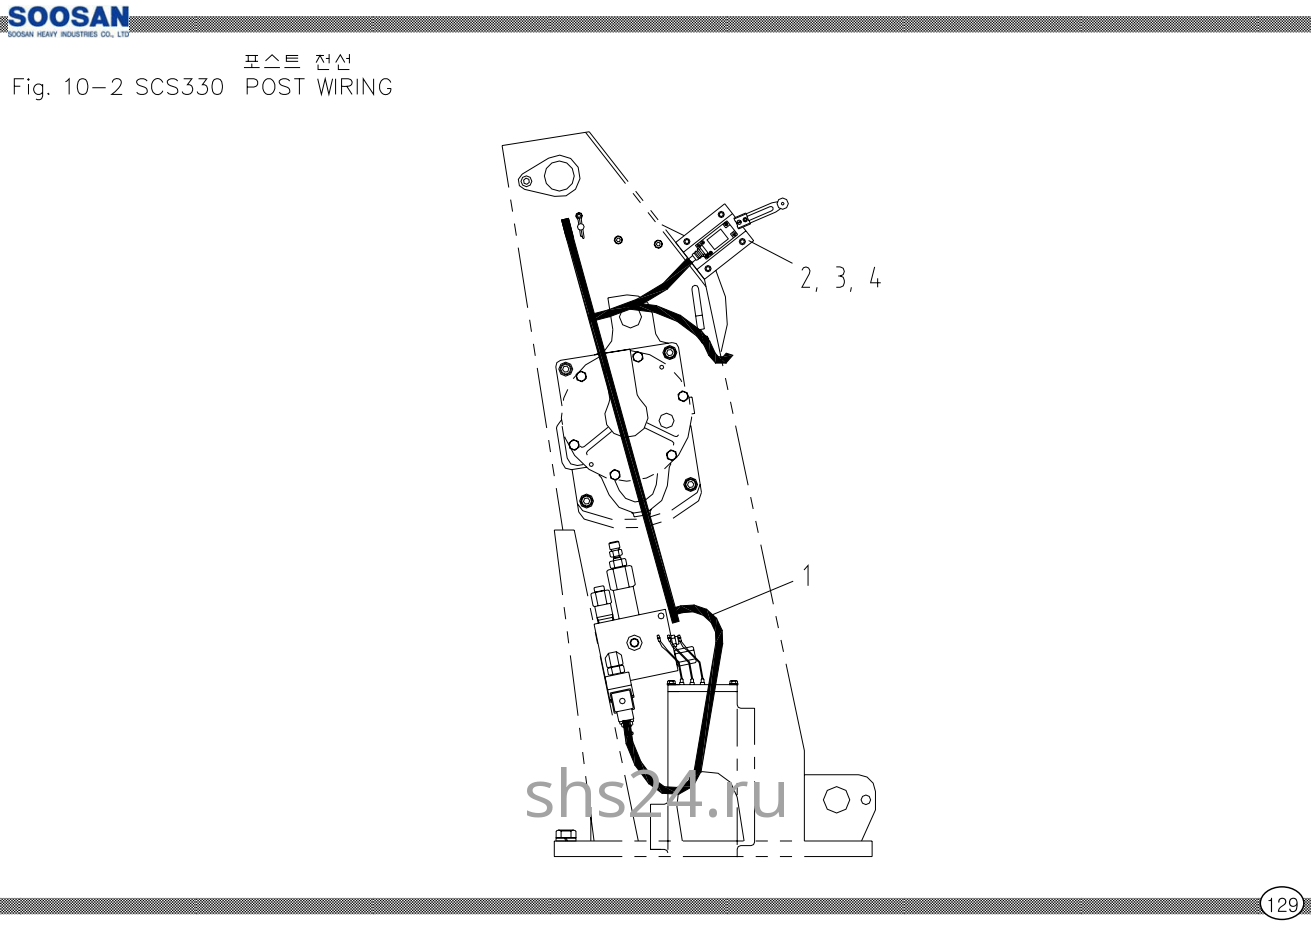 Электропроводка башни Soosan scs 333,334,335